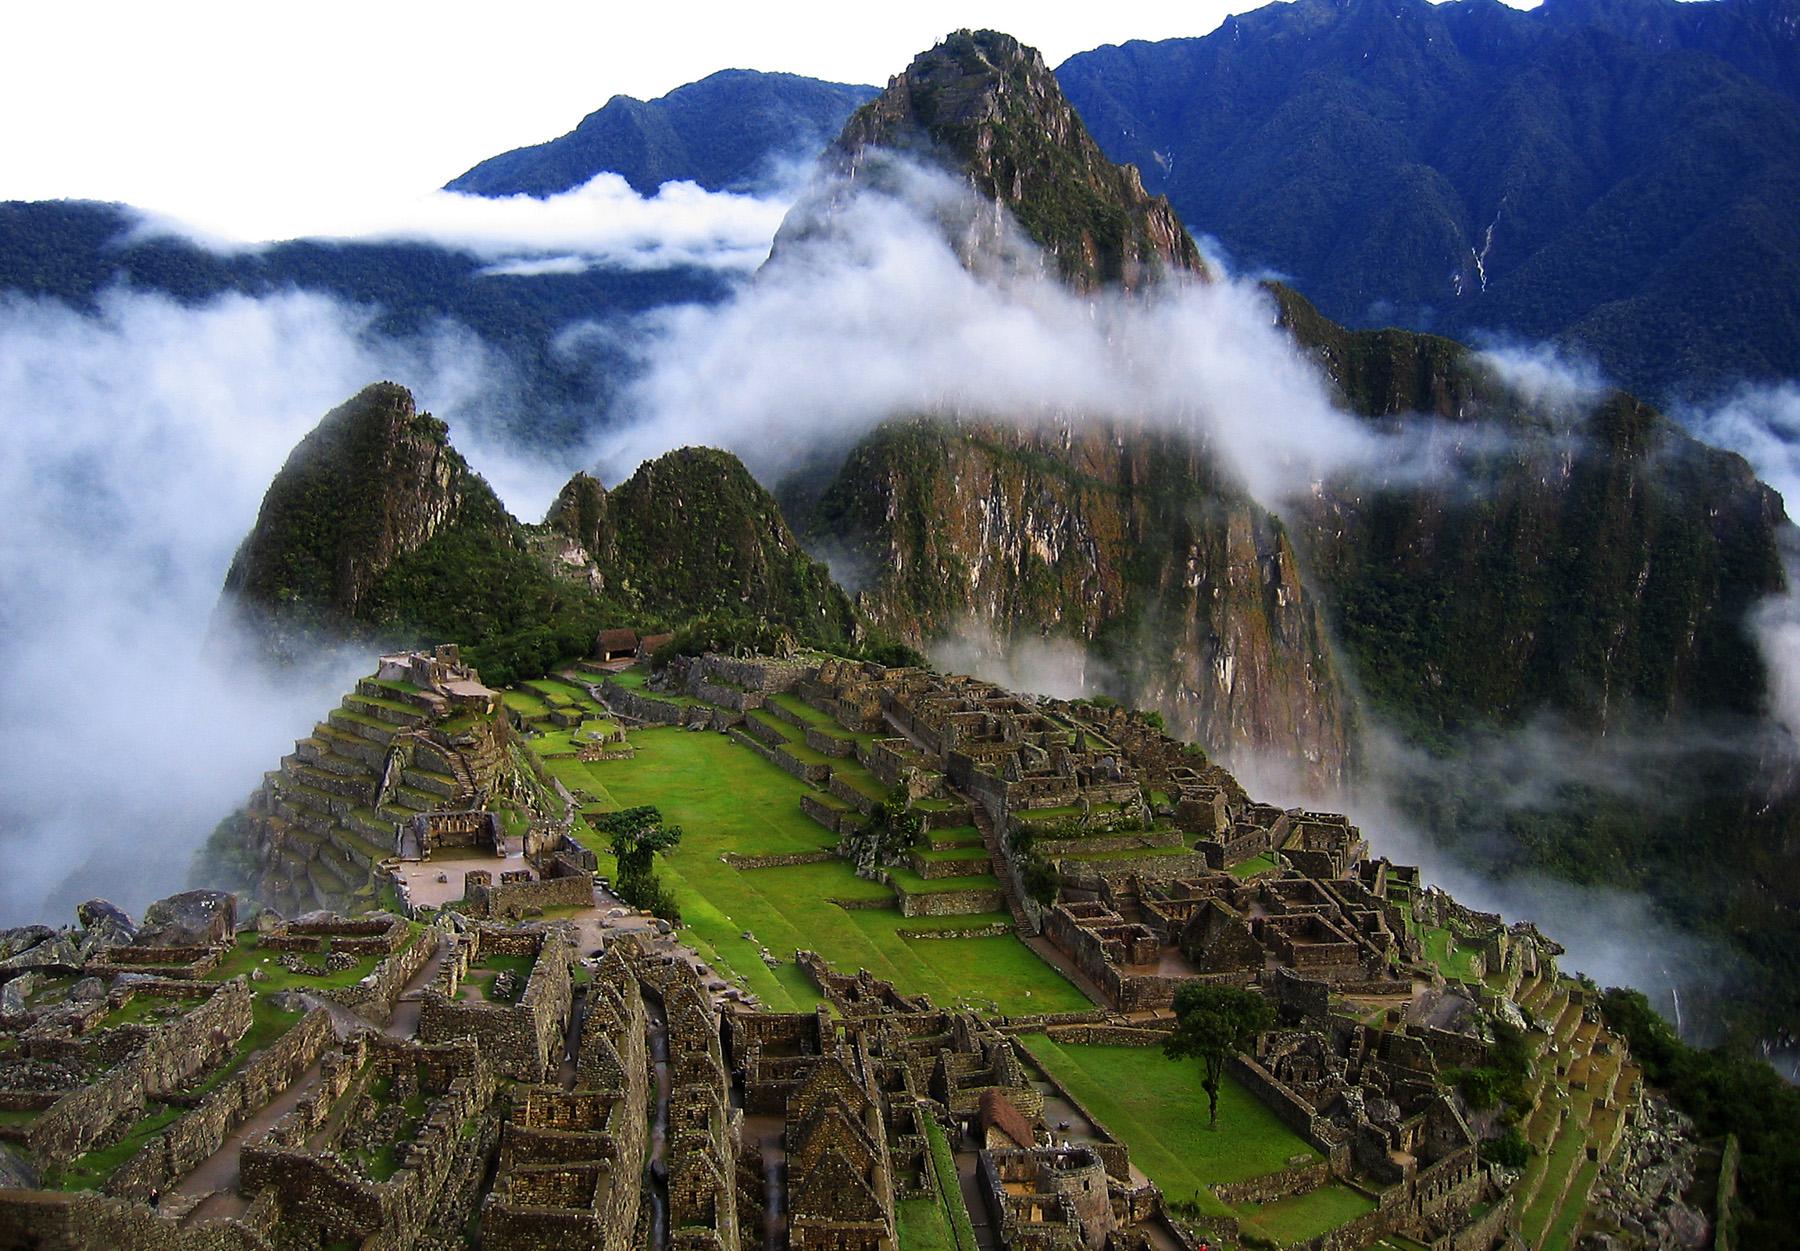 Spiritual Journey to Peru - Experience Machu Picchu & Healing Ceremony